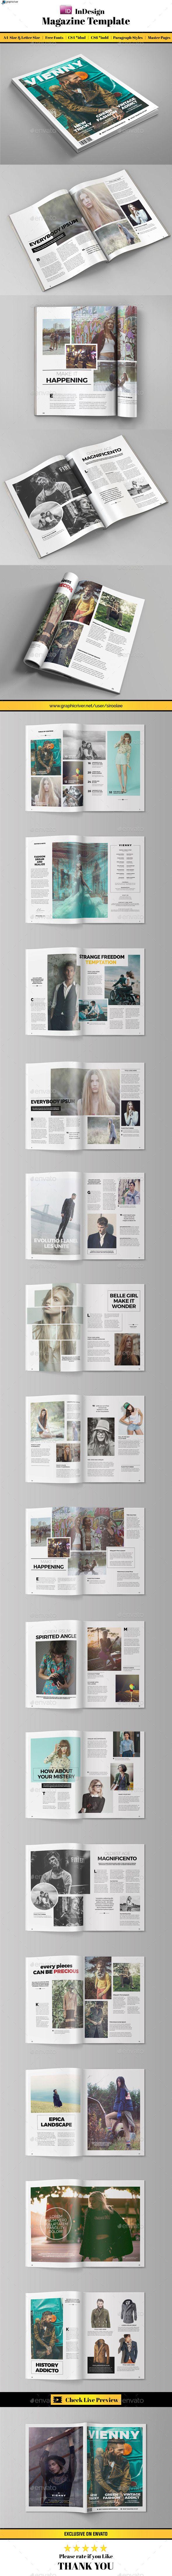 Clean Fashion Magazine Template #design Download: http://graphicriver.net/item/clean-fashion-magazine-/11551601?ref=ksioks